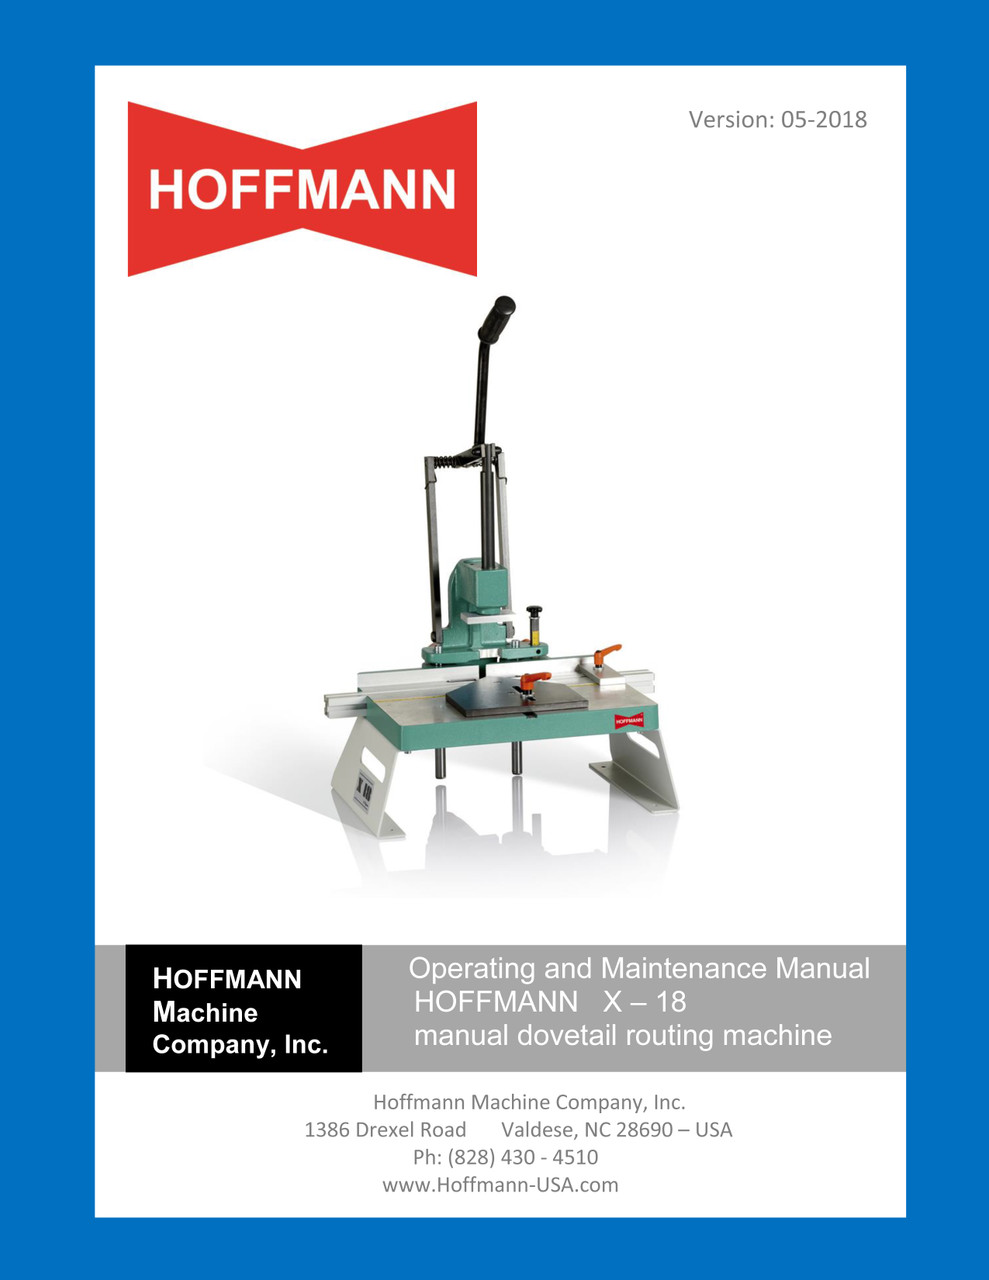 Hoffmann X-18 Operating Manual